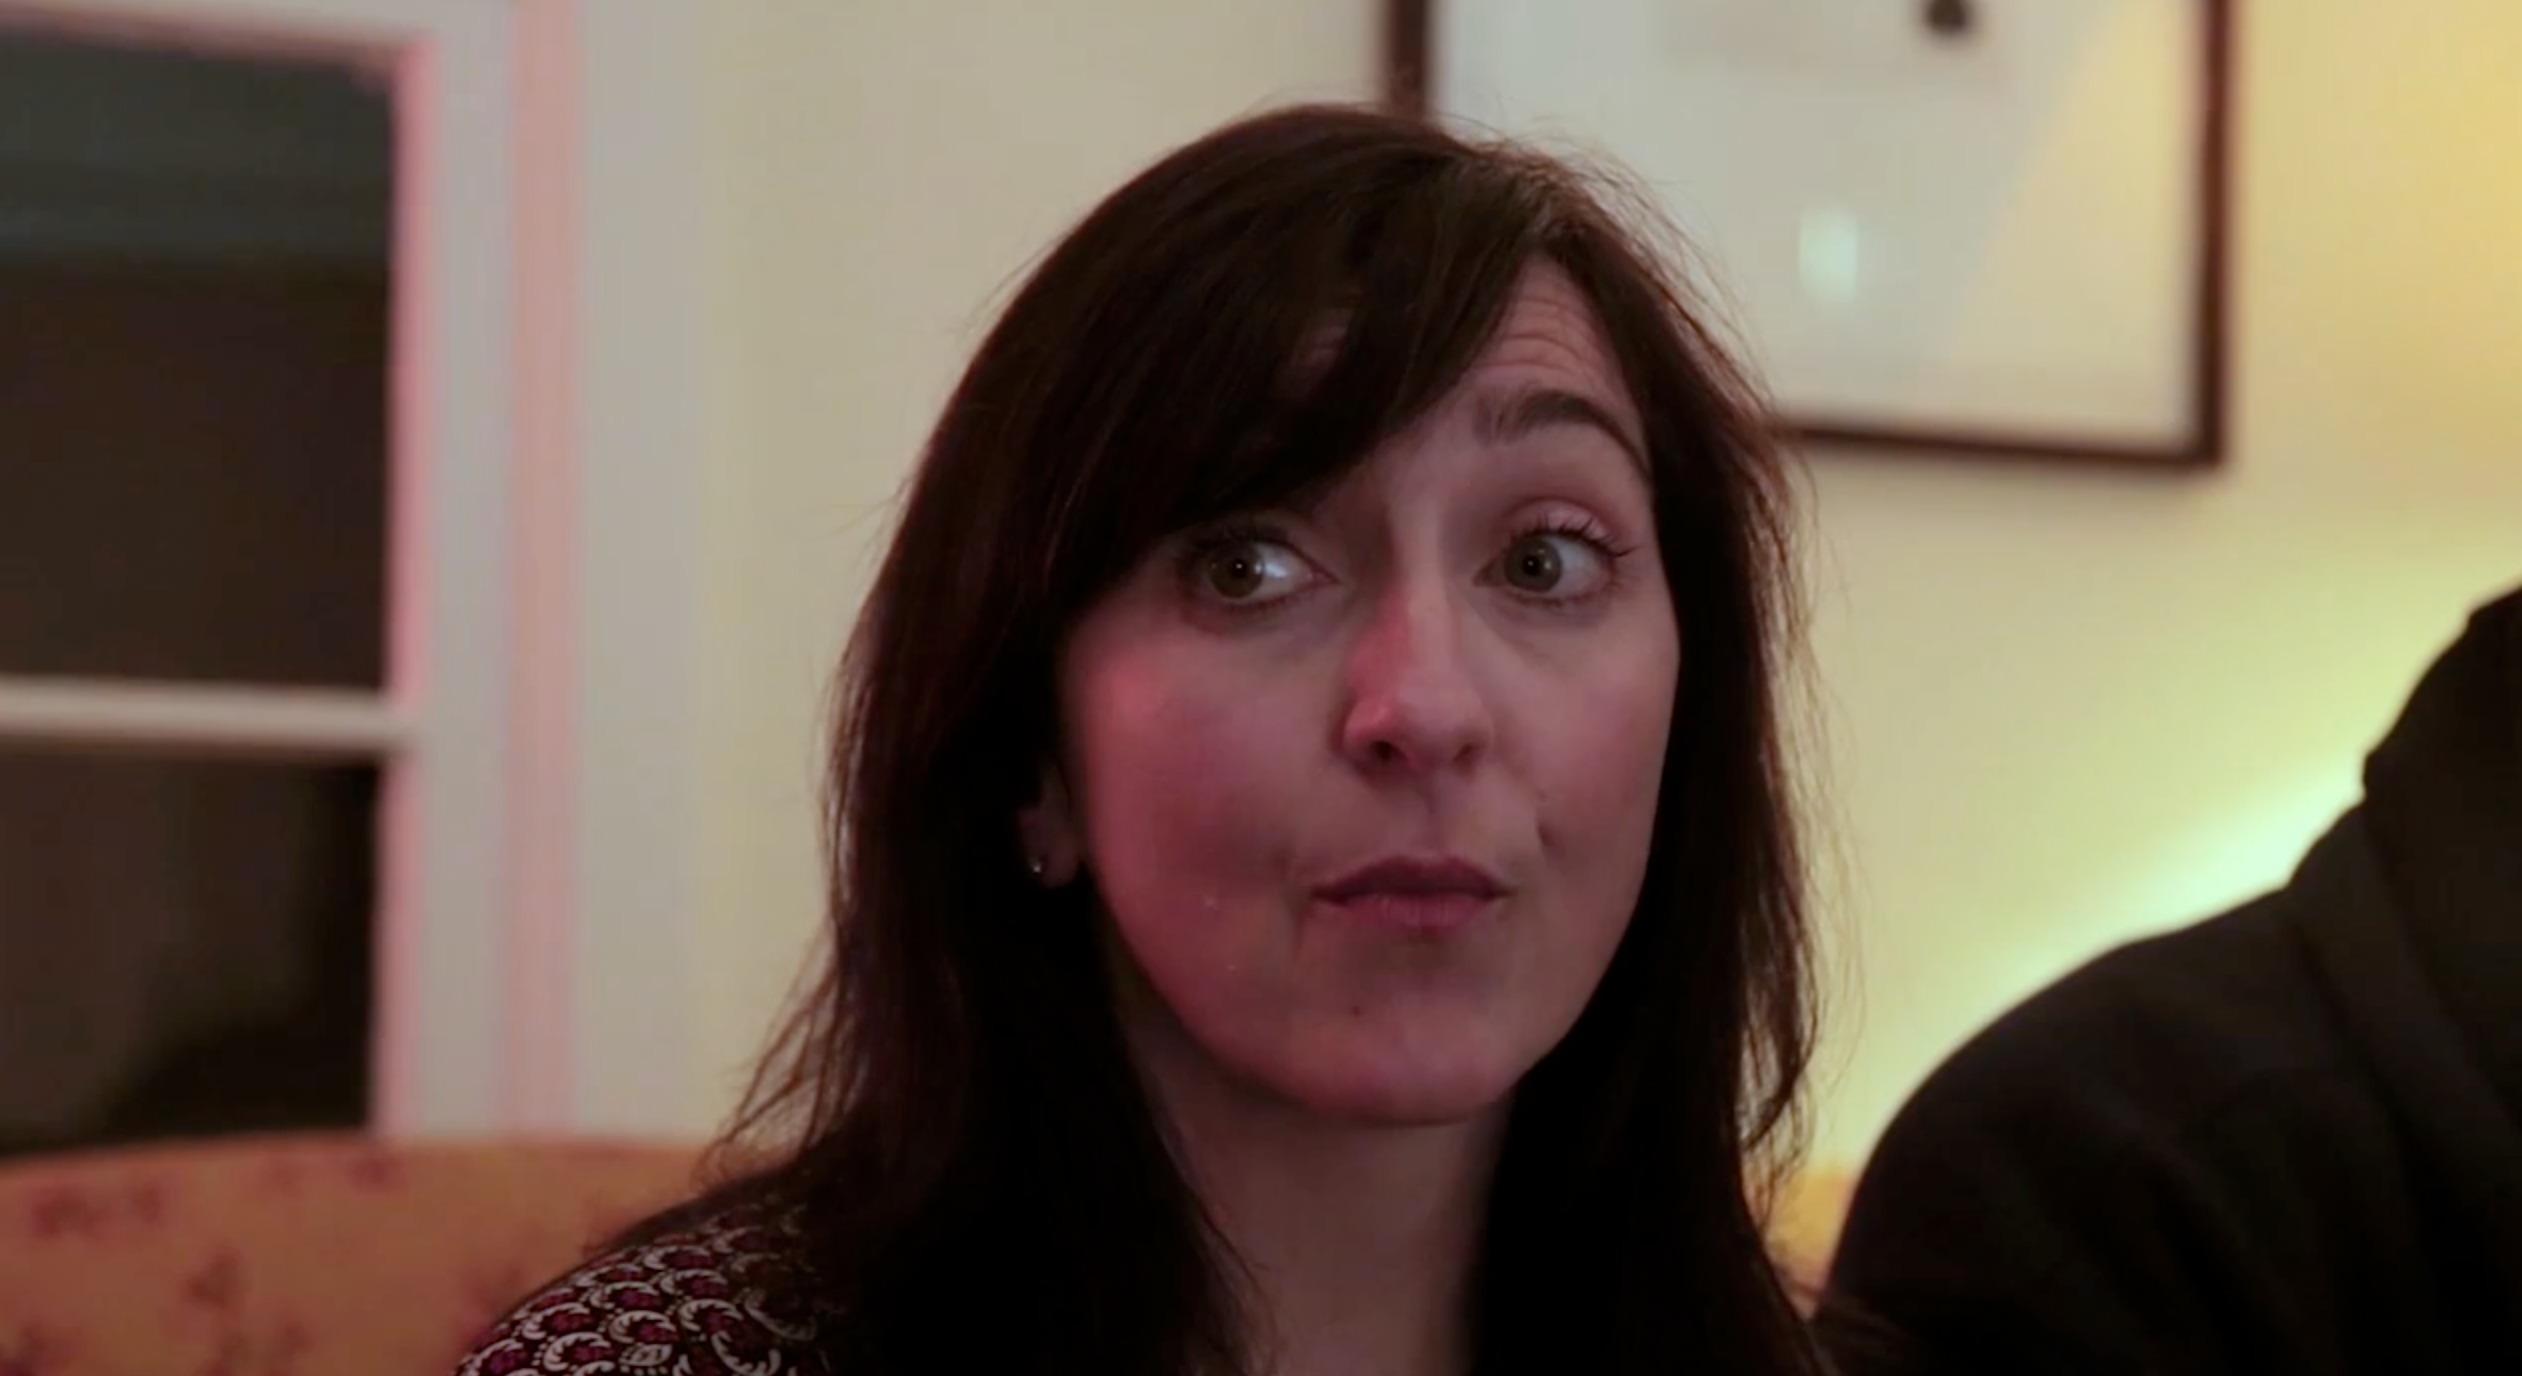 Julie Millett in Wacko Smacko (Sombrero Time)